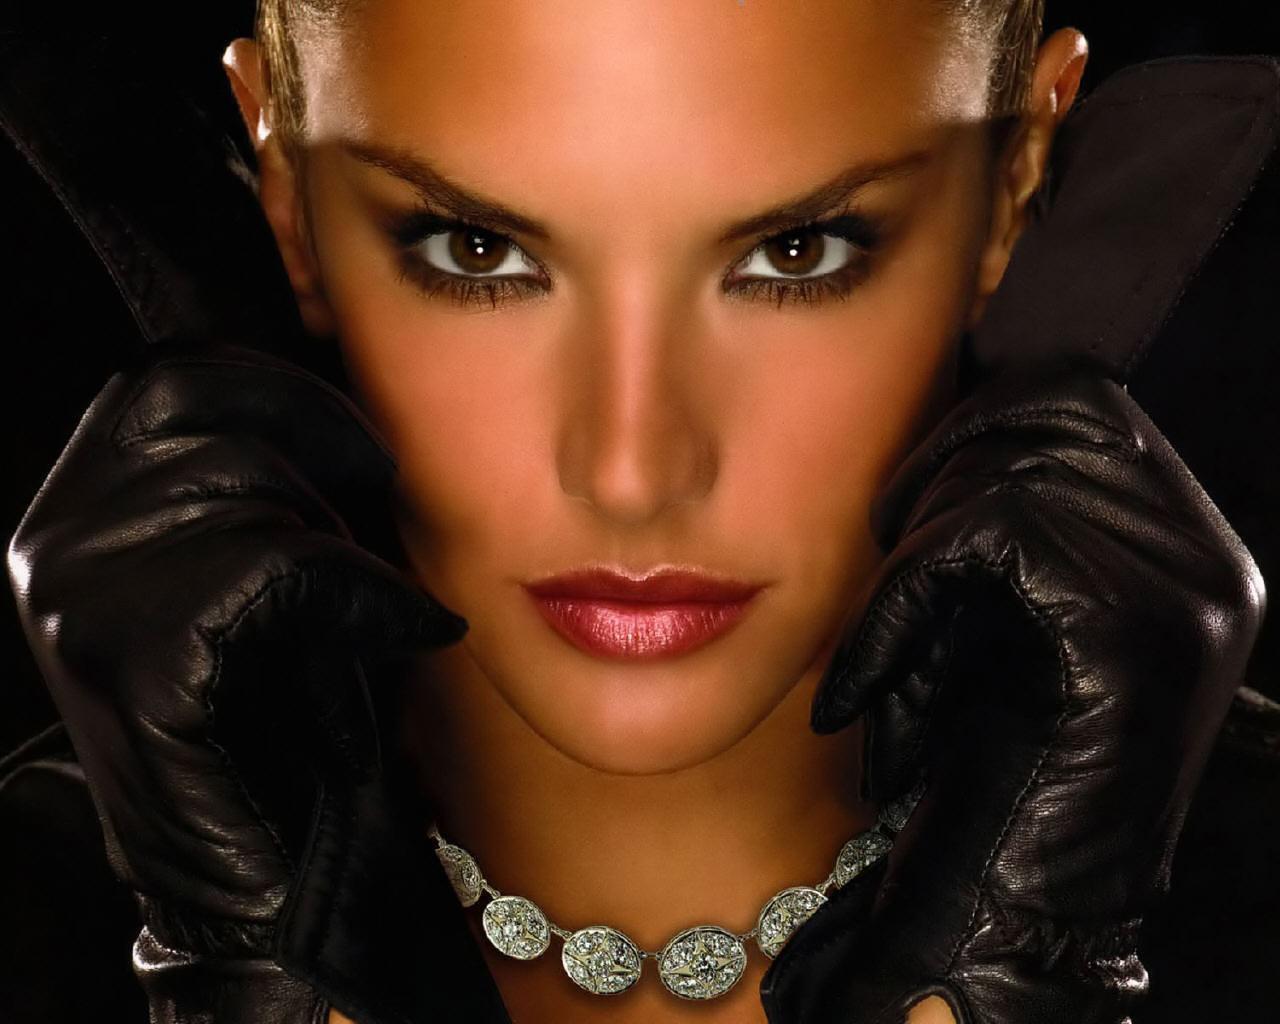 http://2.bp.blogspot.com/_qyk1vn1V4rM/THH2TiBE9zI/AAAAAAAAAxM/M1kip9LQSpg/s1600/Alessandra_Ambrosio_Fashion_Model_2.jpg